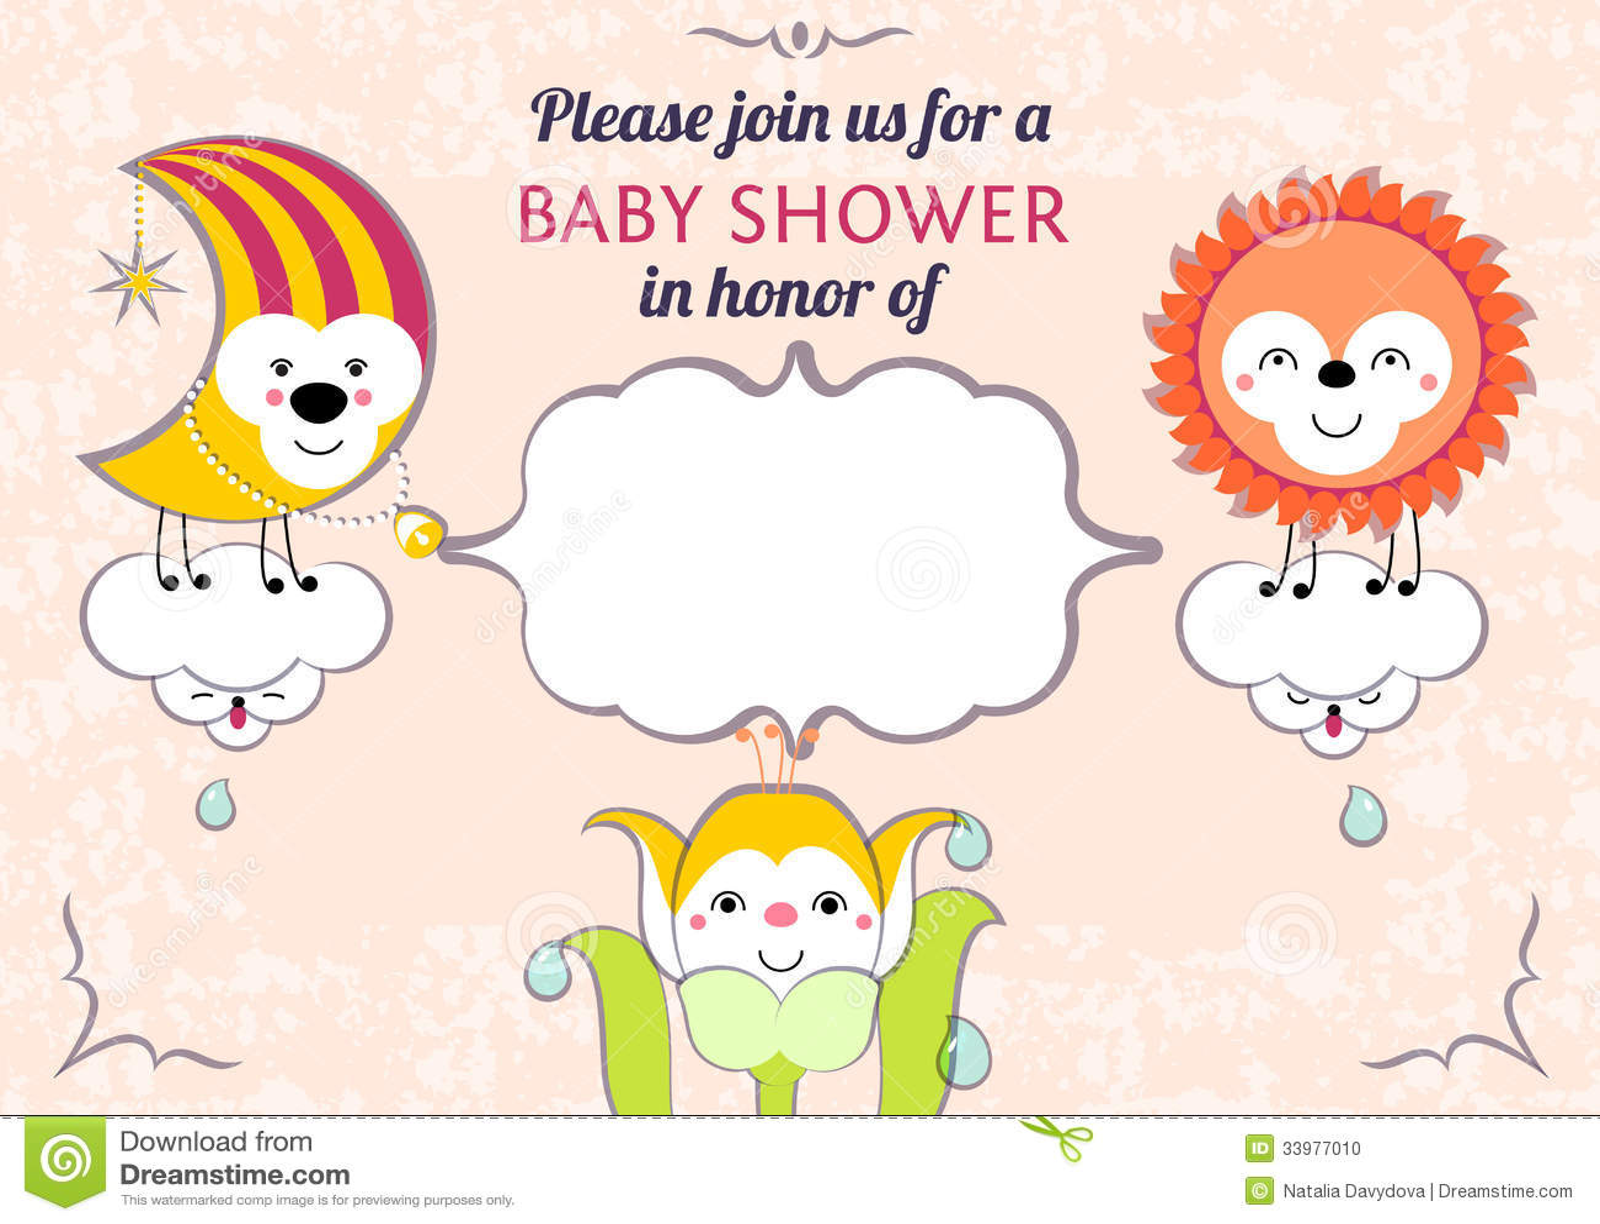 Baby Shower Invitation Card Editable Template Funn Stock ...